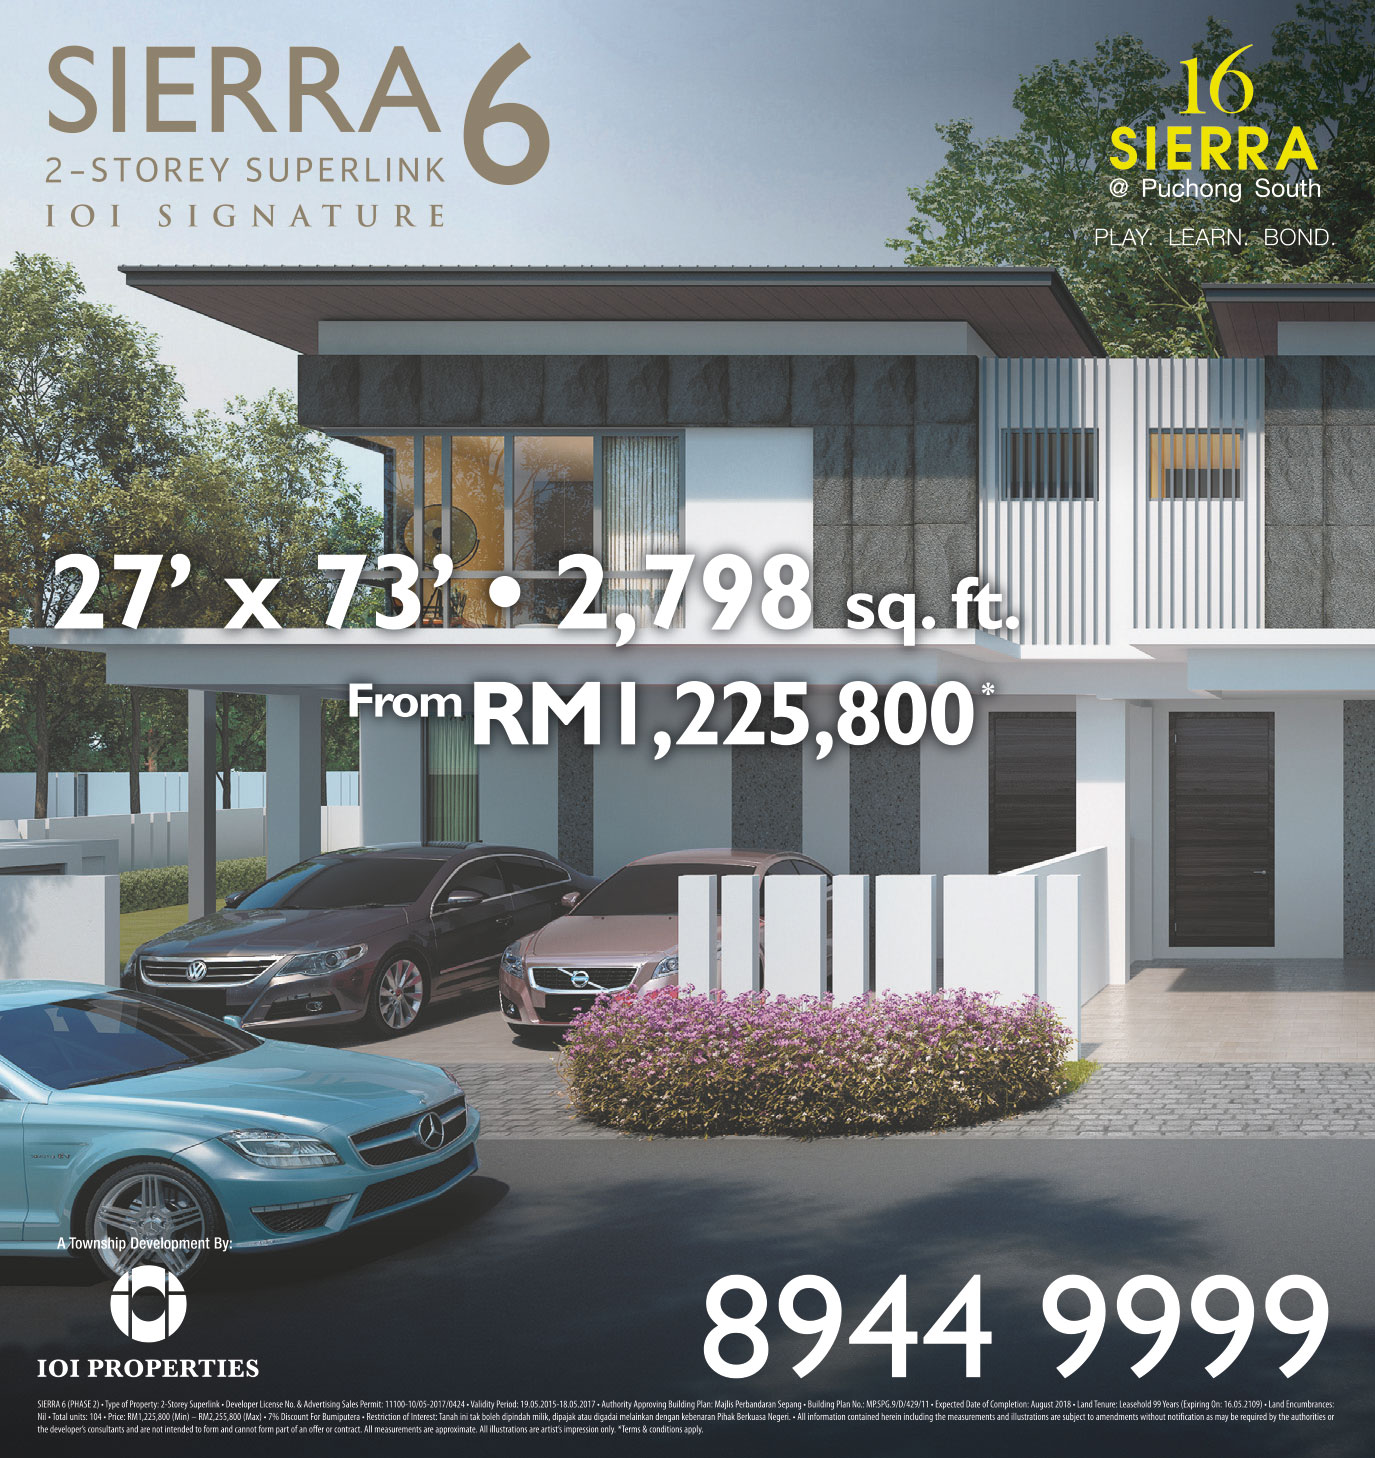 Sierra6b propsocial webbanners fa 330x350px